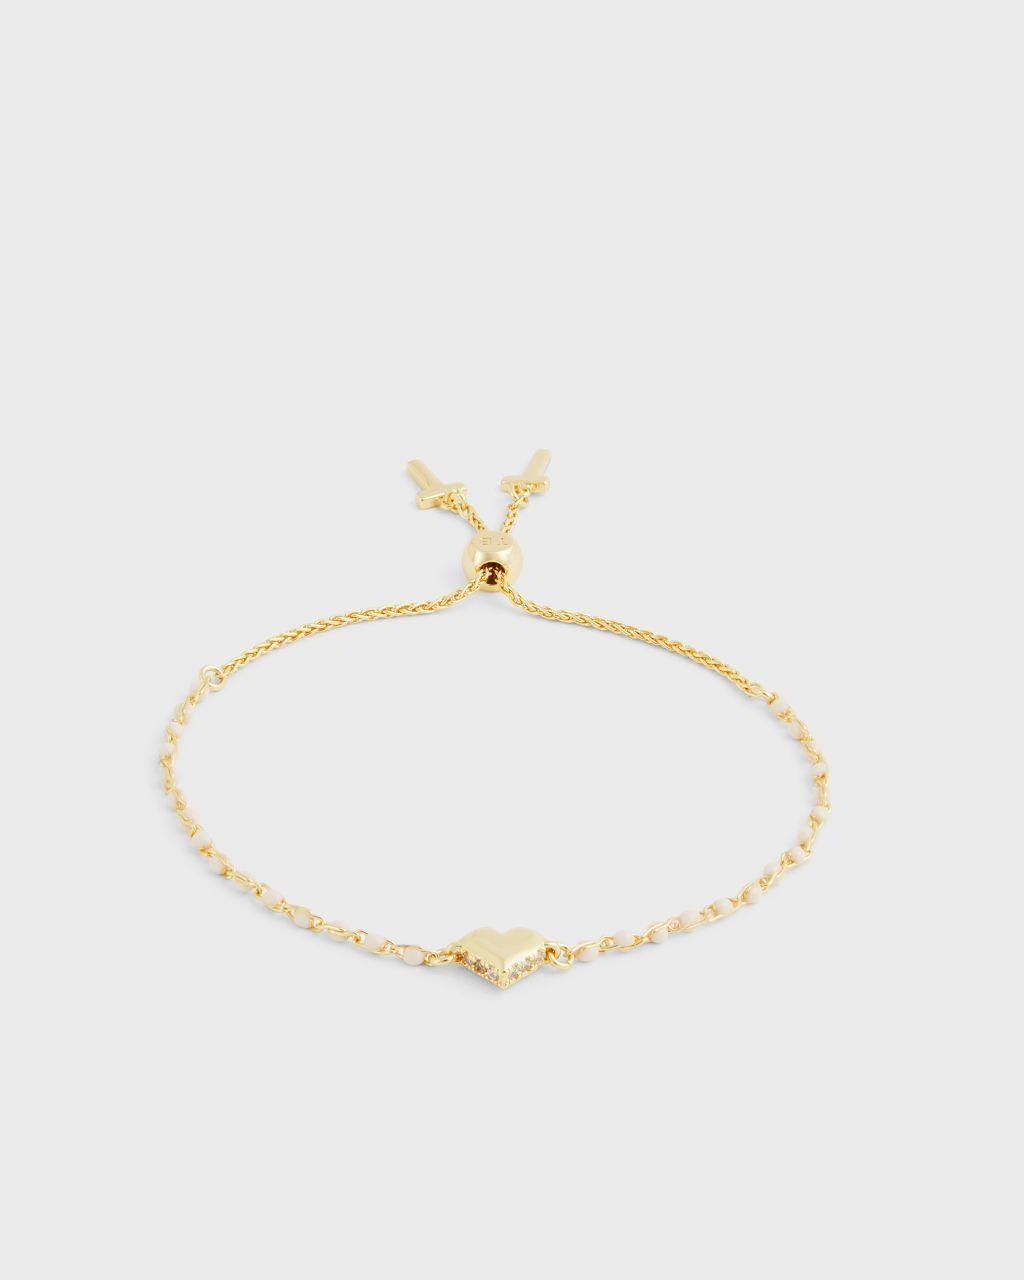 Ted Baker Tbj2730 Sparkle Heart Enamel Chain Bracelet  - Gold - Size: One Size